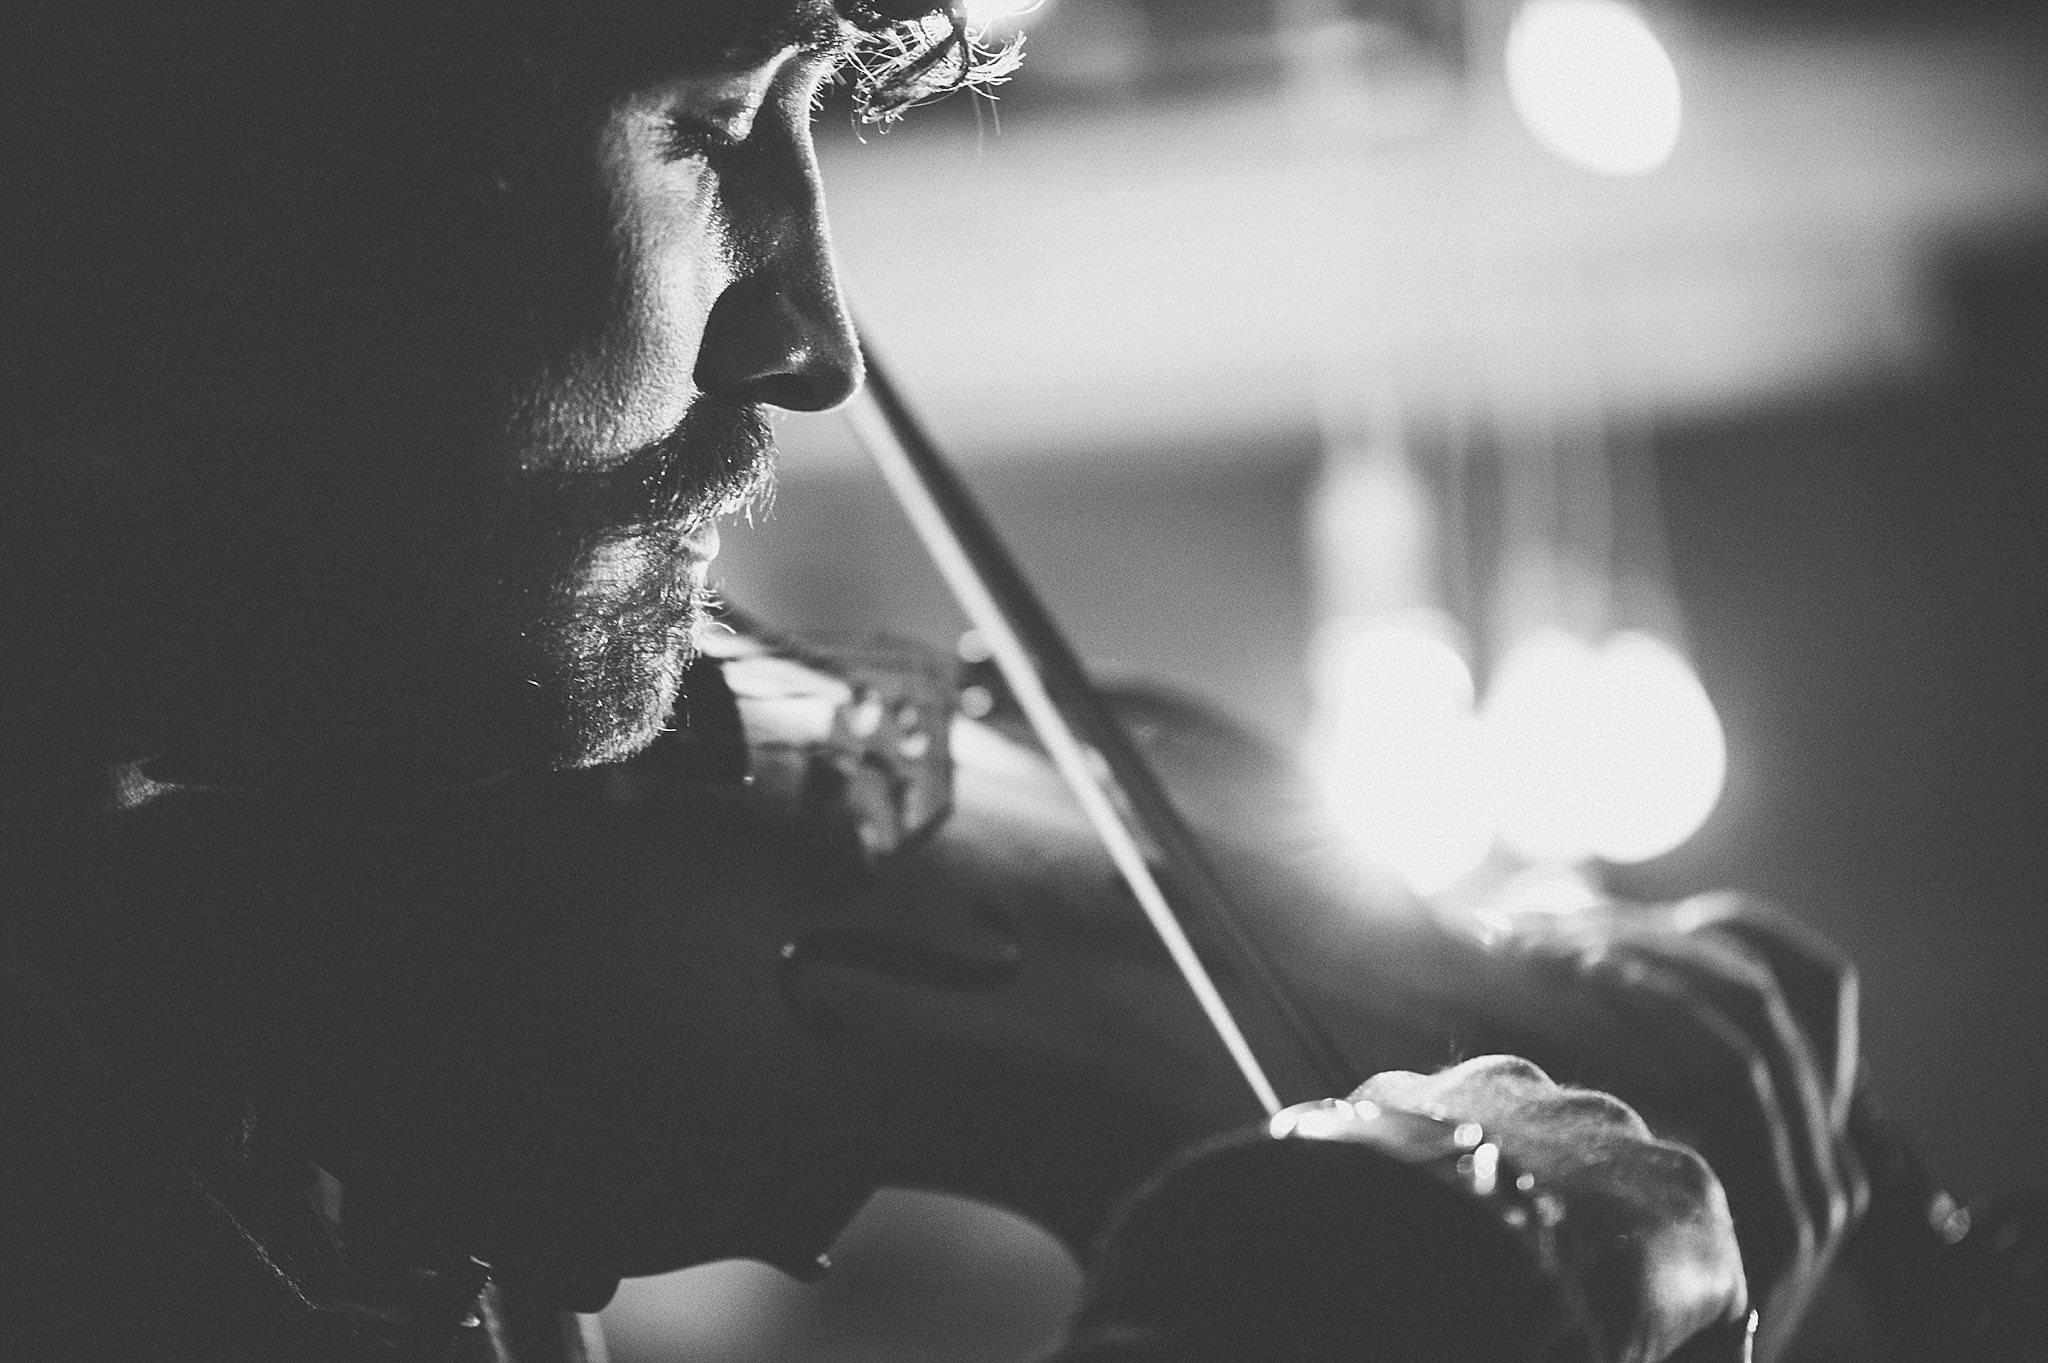 aga-tomaszek-music-photographer-cardiff_1383